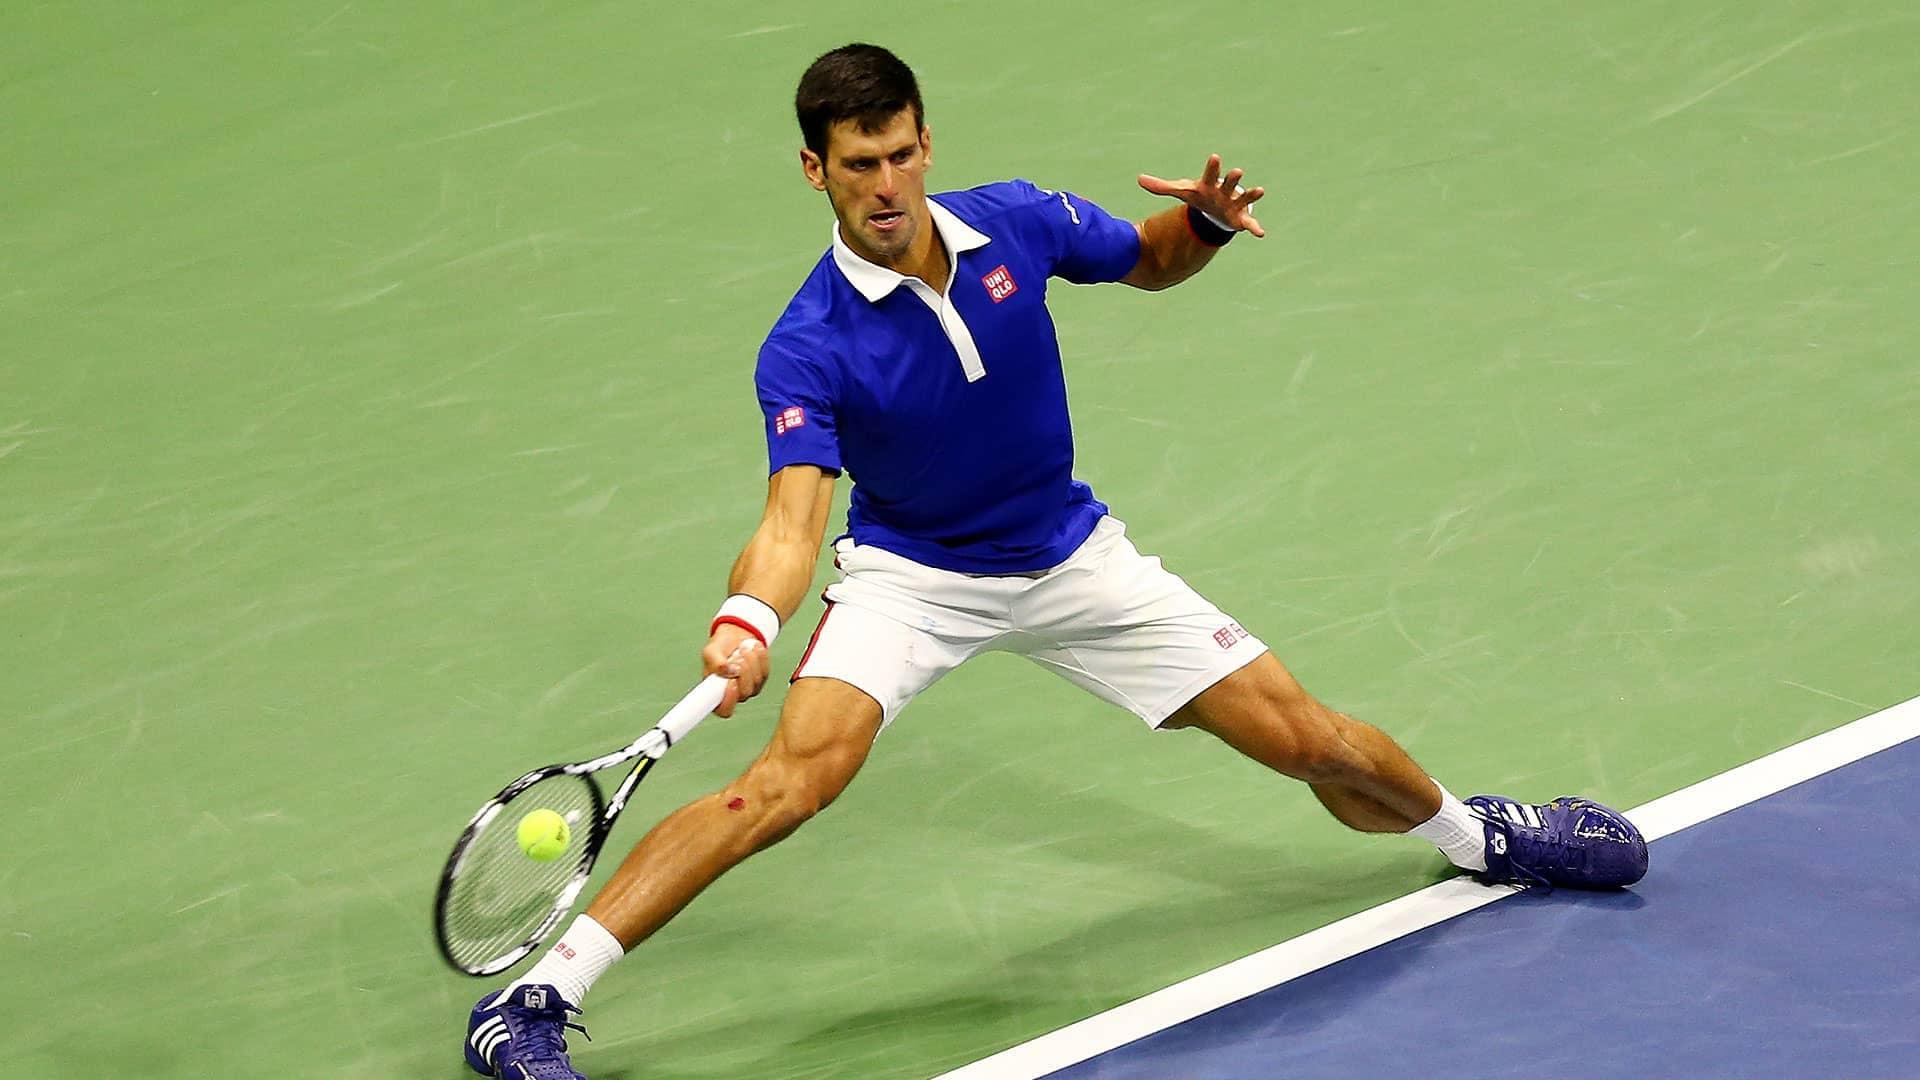 How The 2015 US Open Final Was Won Djokovic Vs Federer